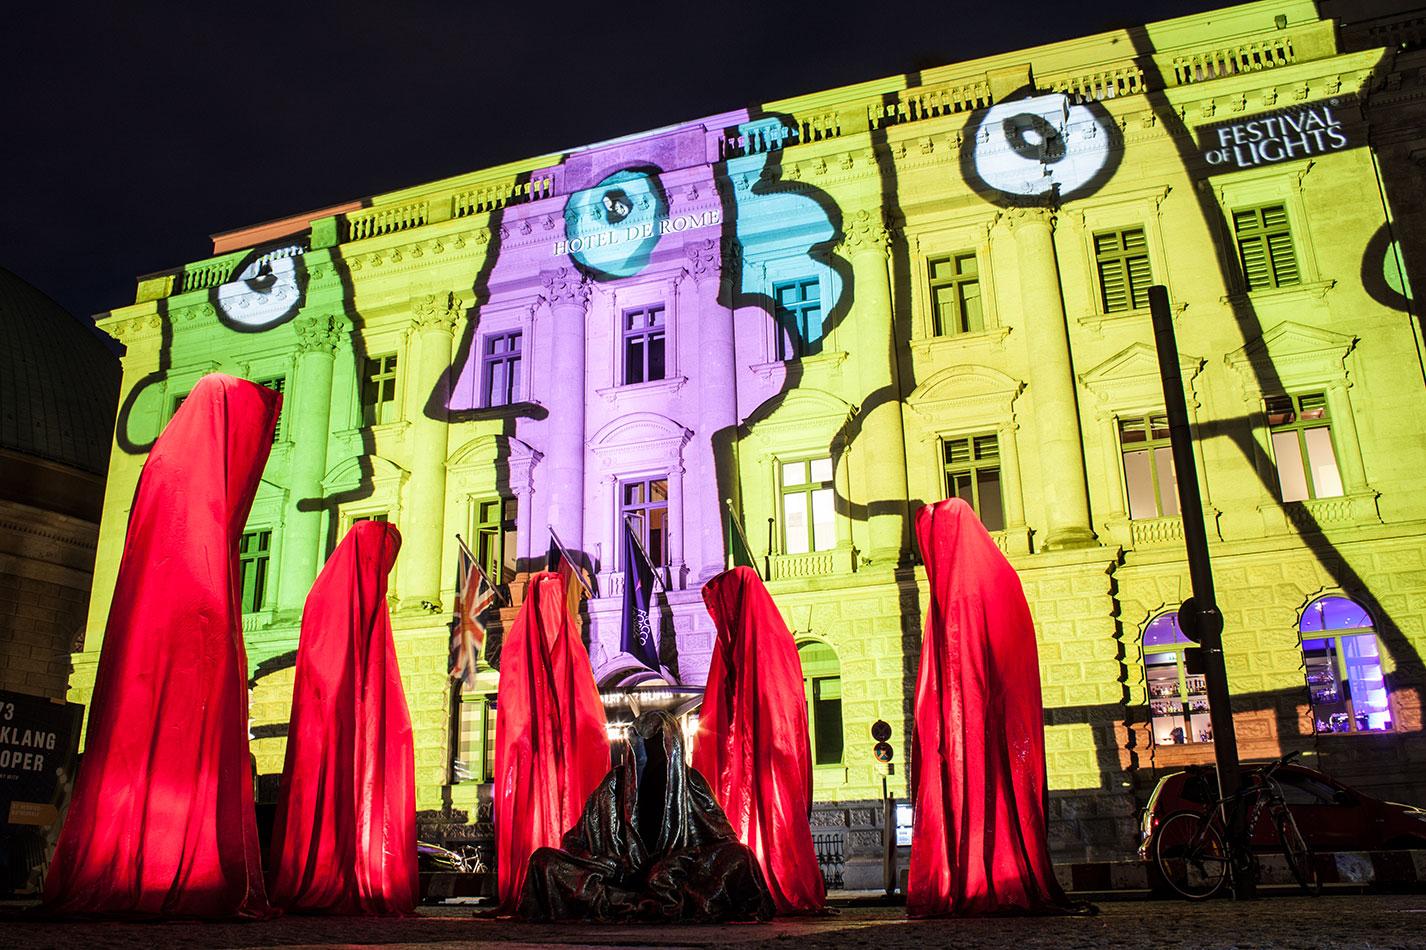 festival-of-lights-berlin-hotel-de-rome-light-art-show-exhibition-lumina-guardians-of-time-manfred-kili-kielnhofer-contemporary-arts-design-sculpture-3371